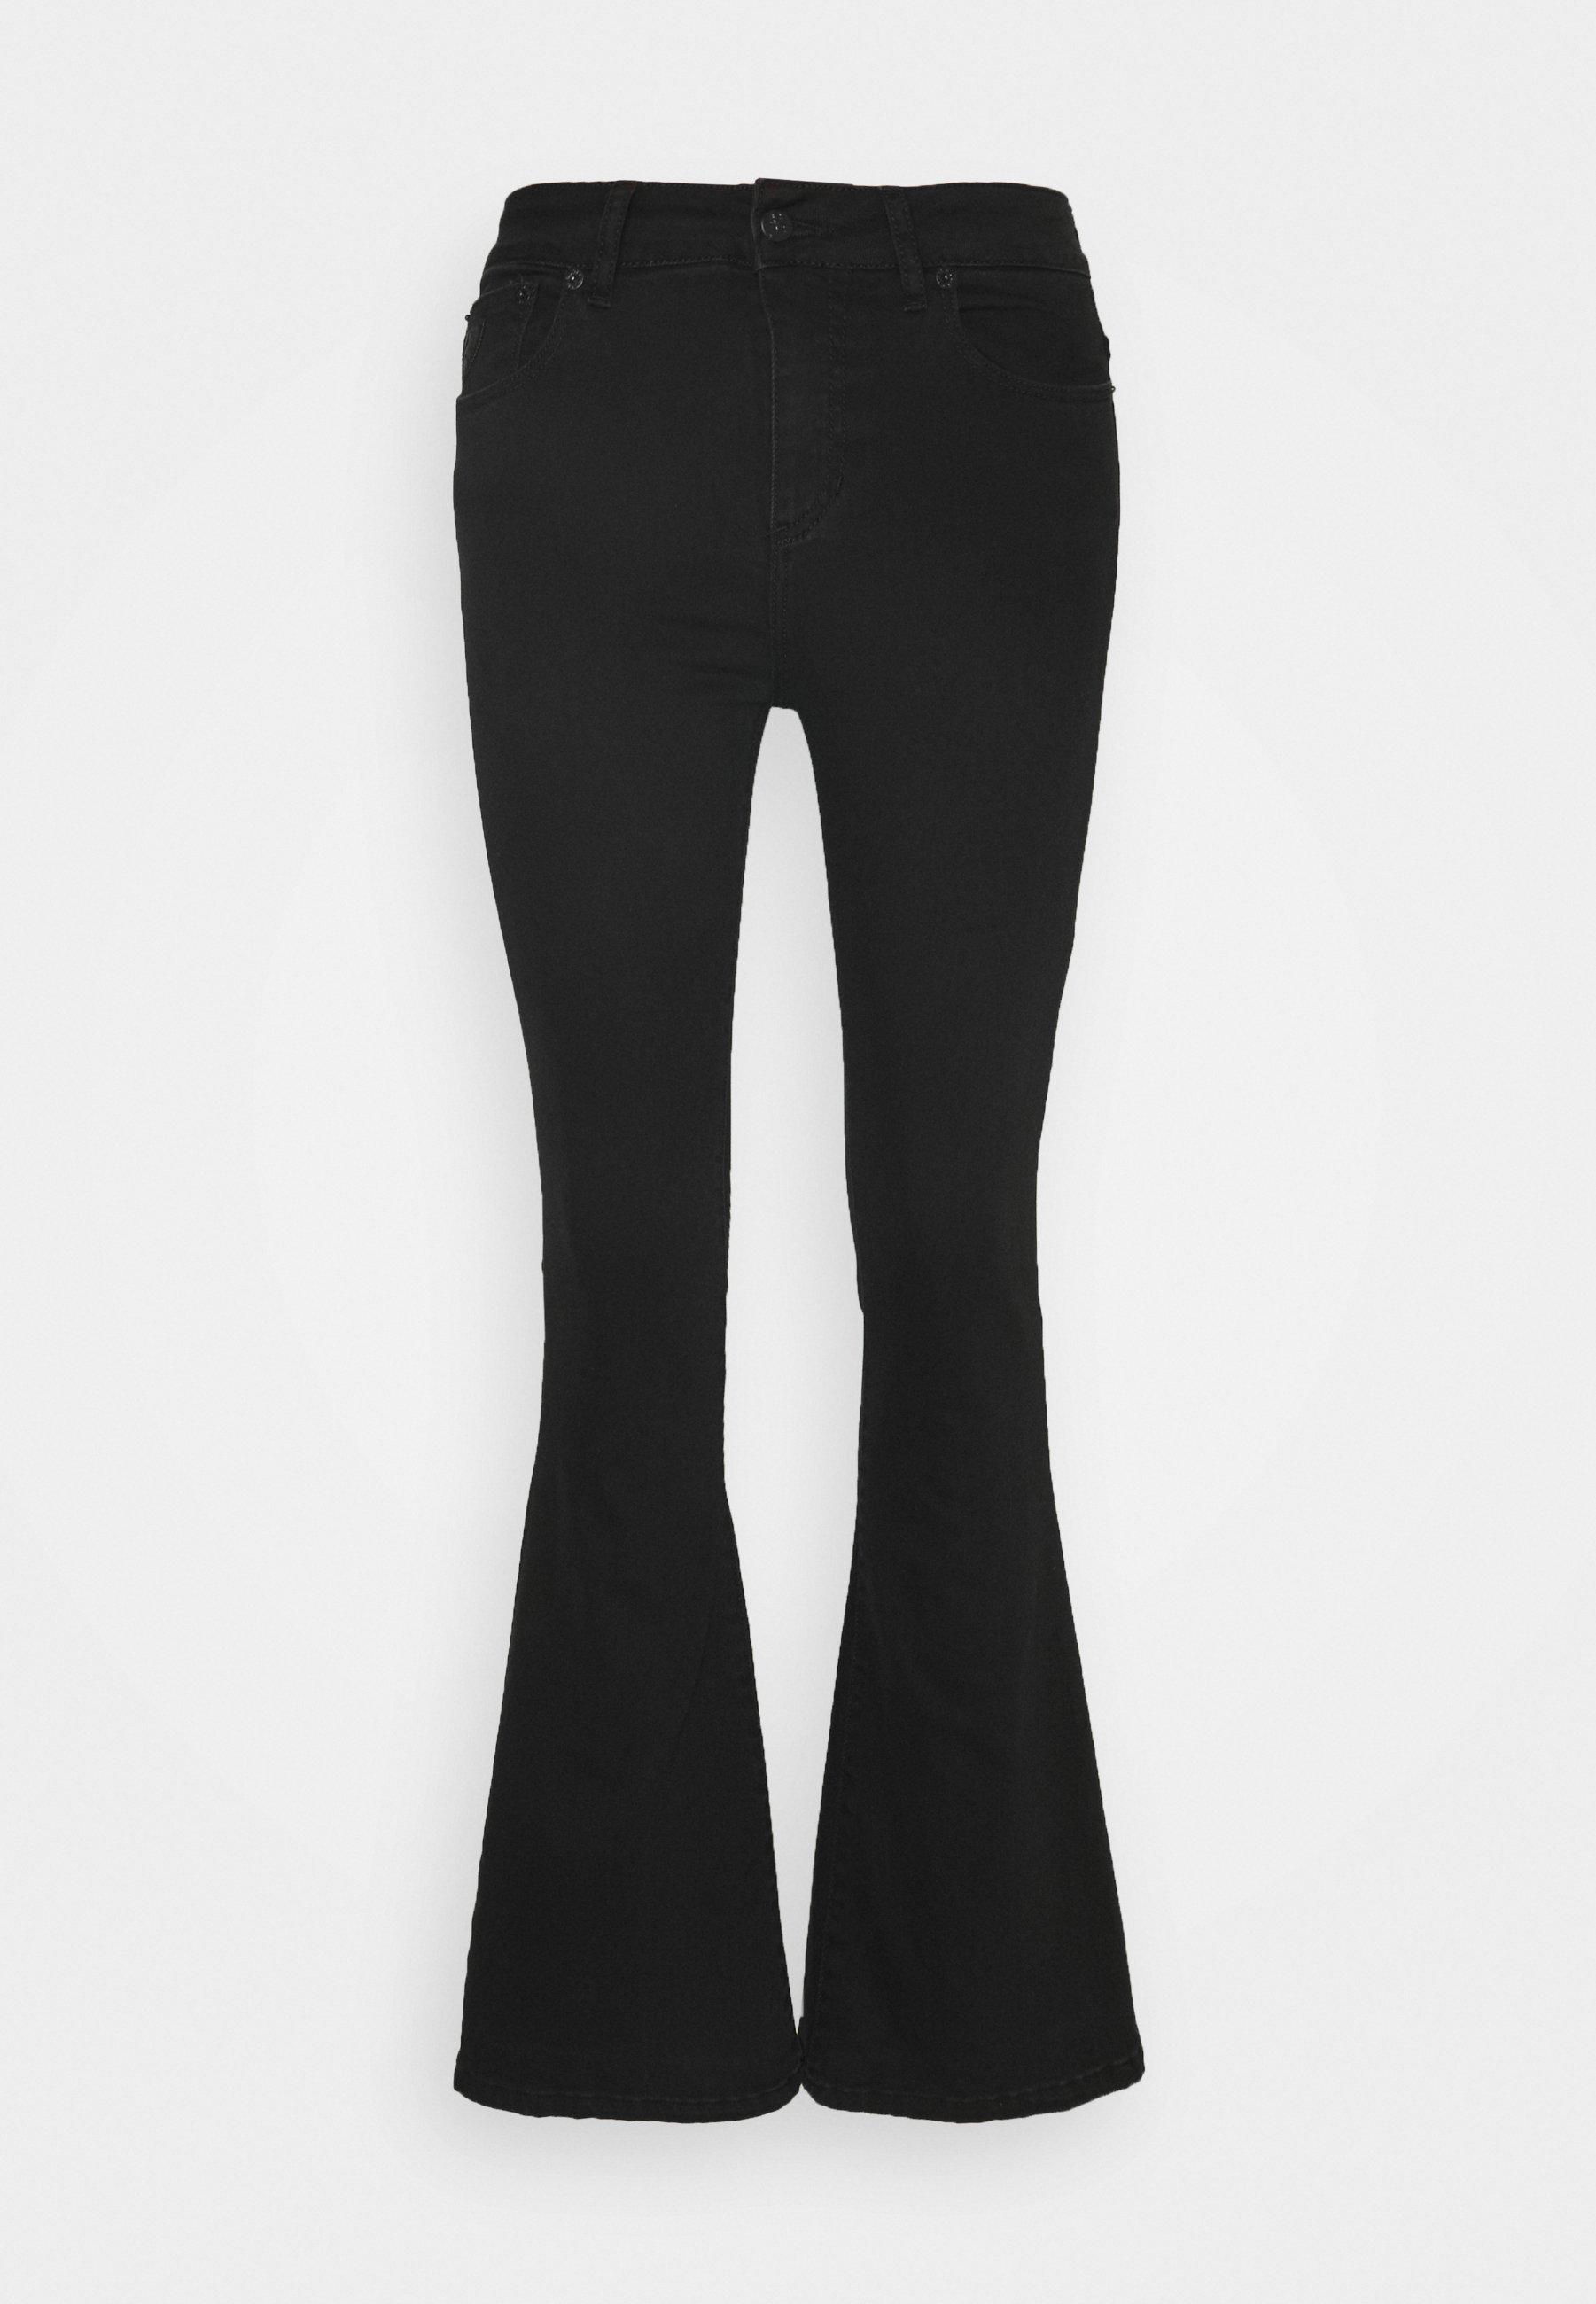 Pink Melrose Velour Solid Bukser | Lois | Boot cut Jeans